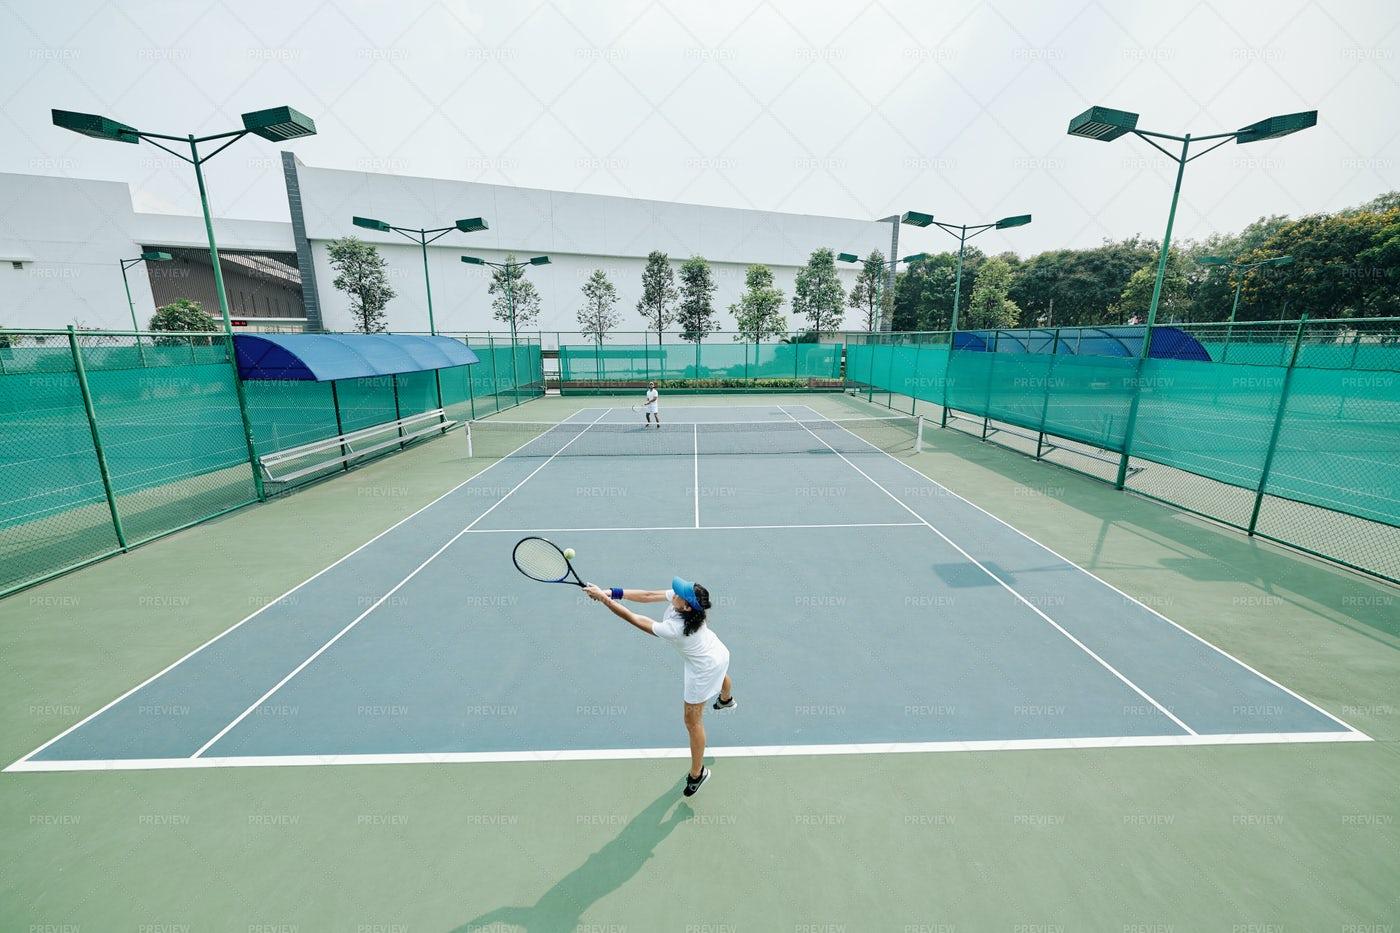 Tennis Player Jumping And Hitting Ball: Stock Photos